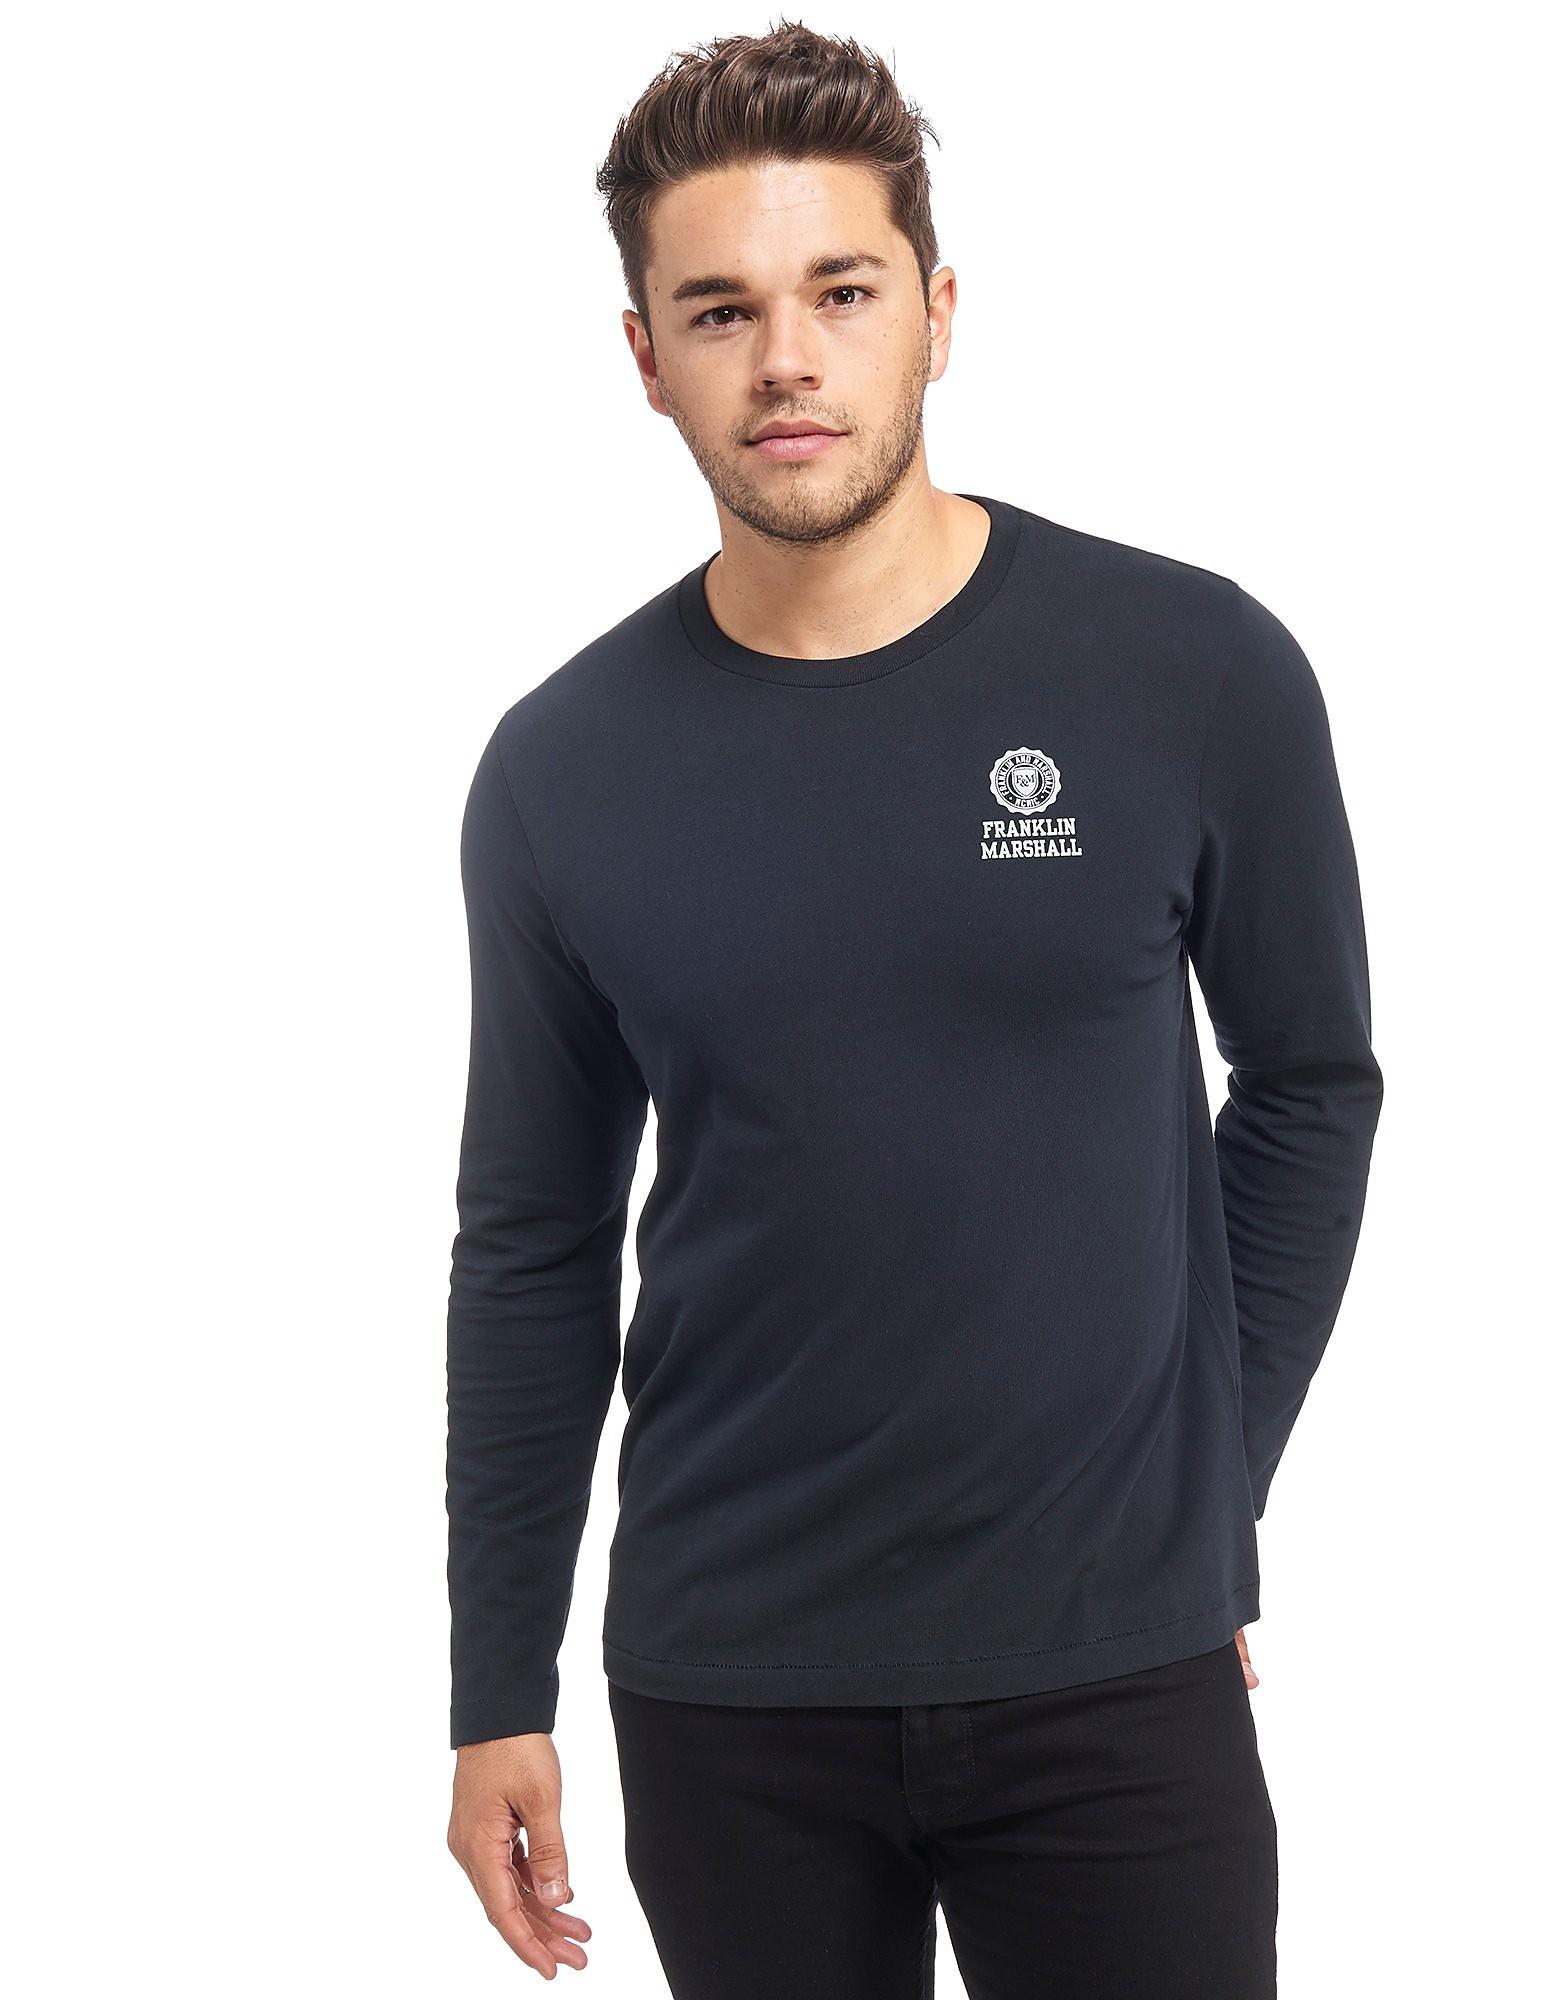 Franklin & Marshall Crest Longsleeve T-Shirt